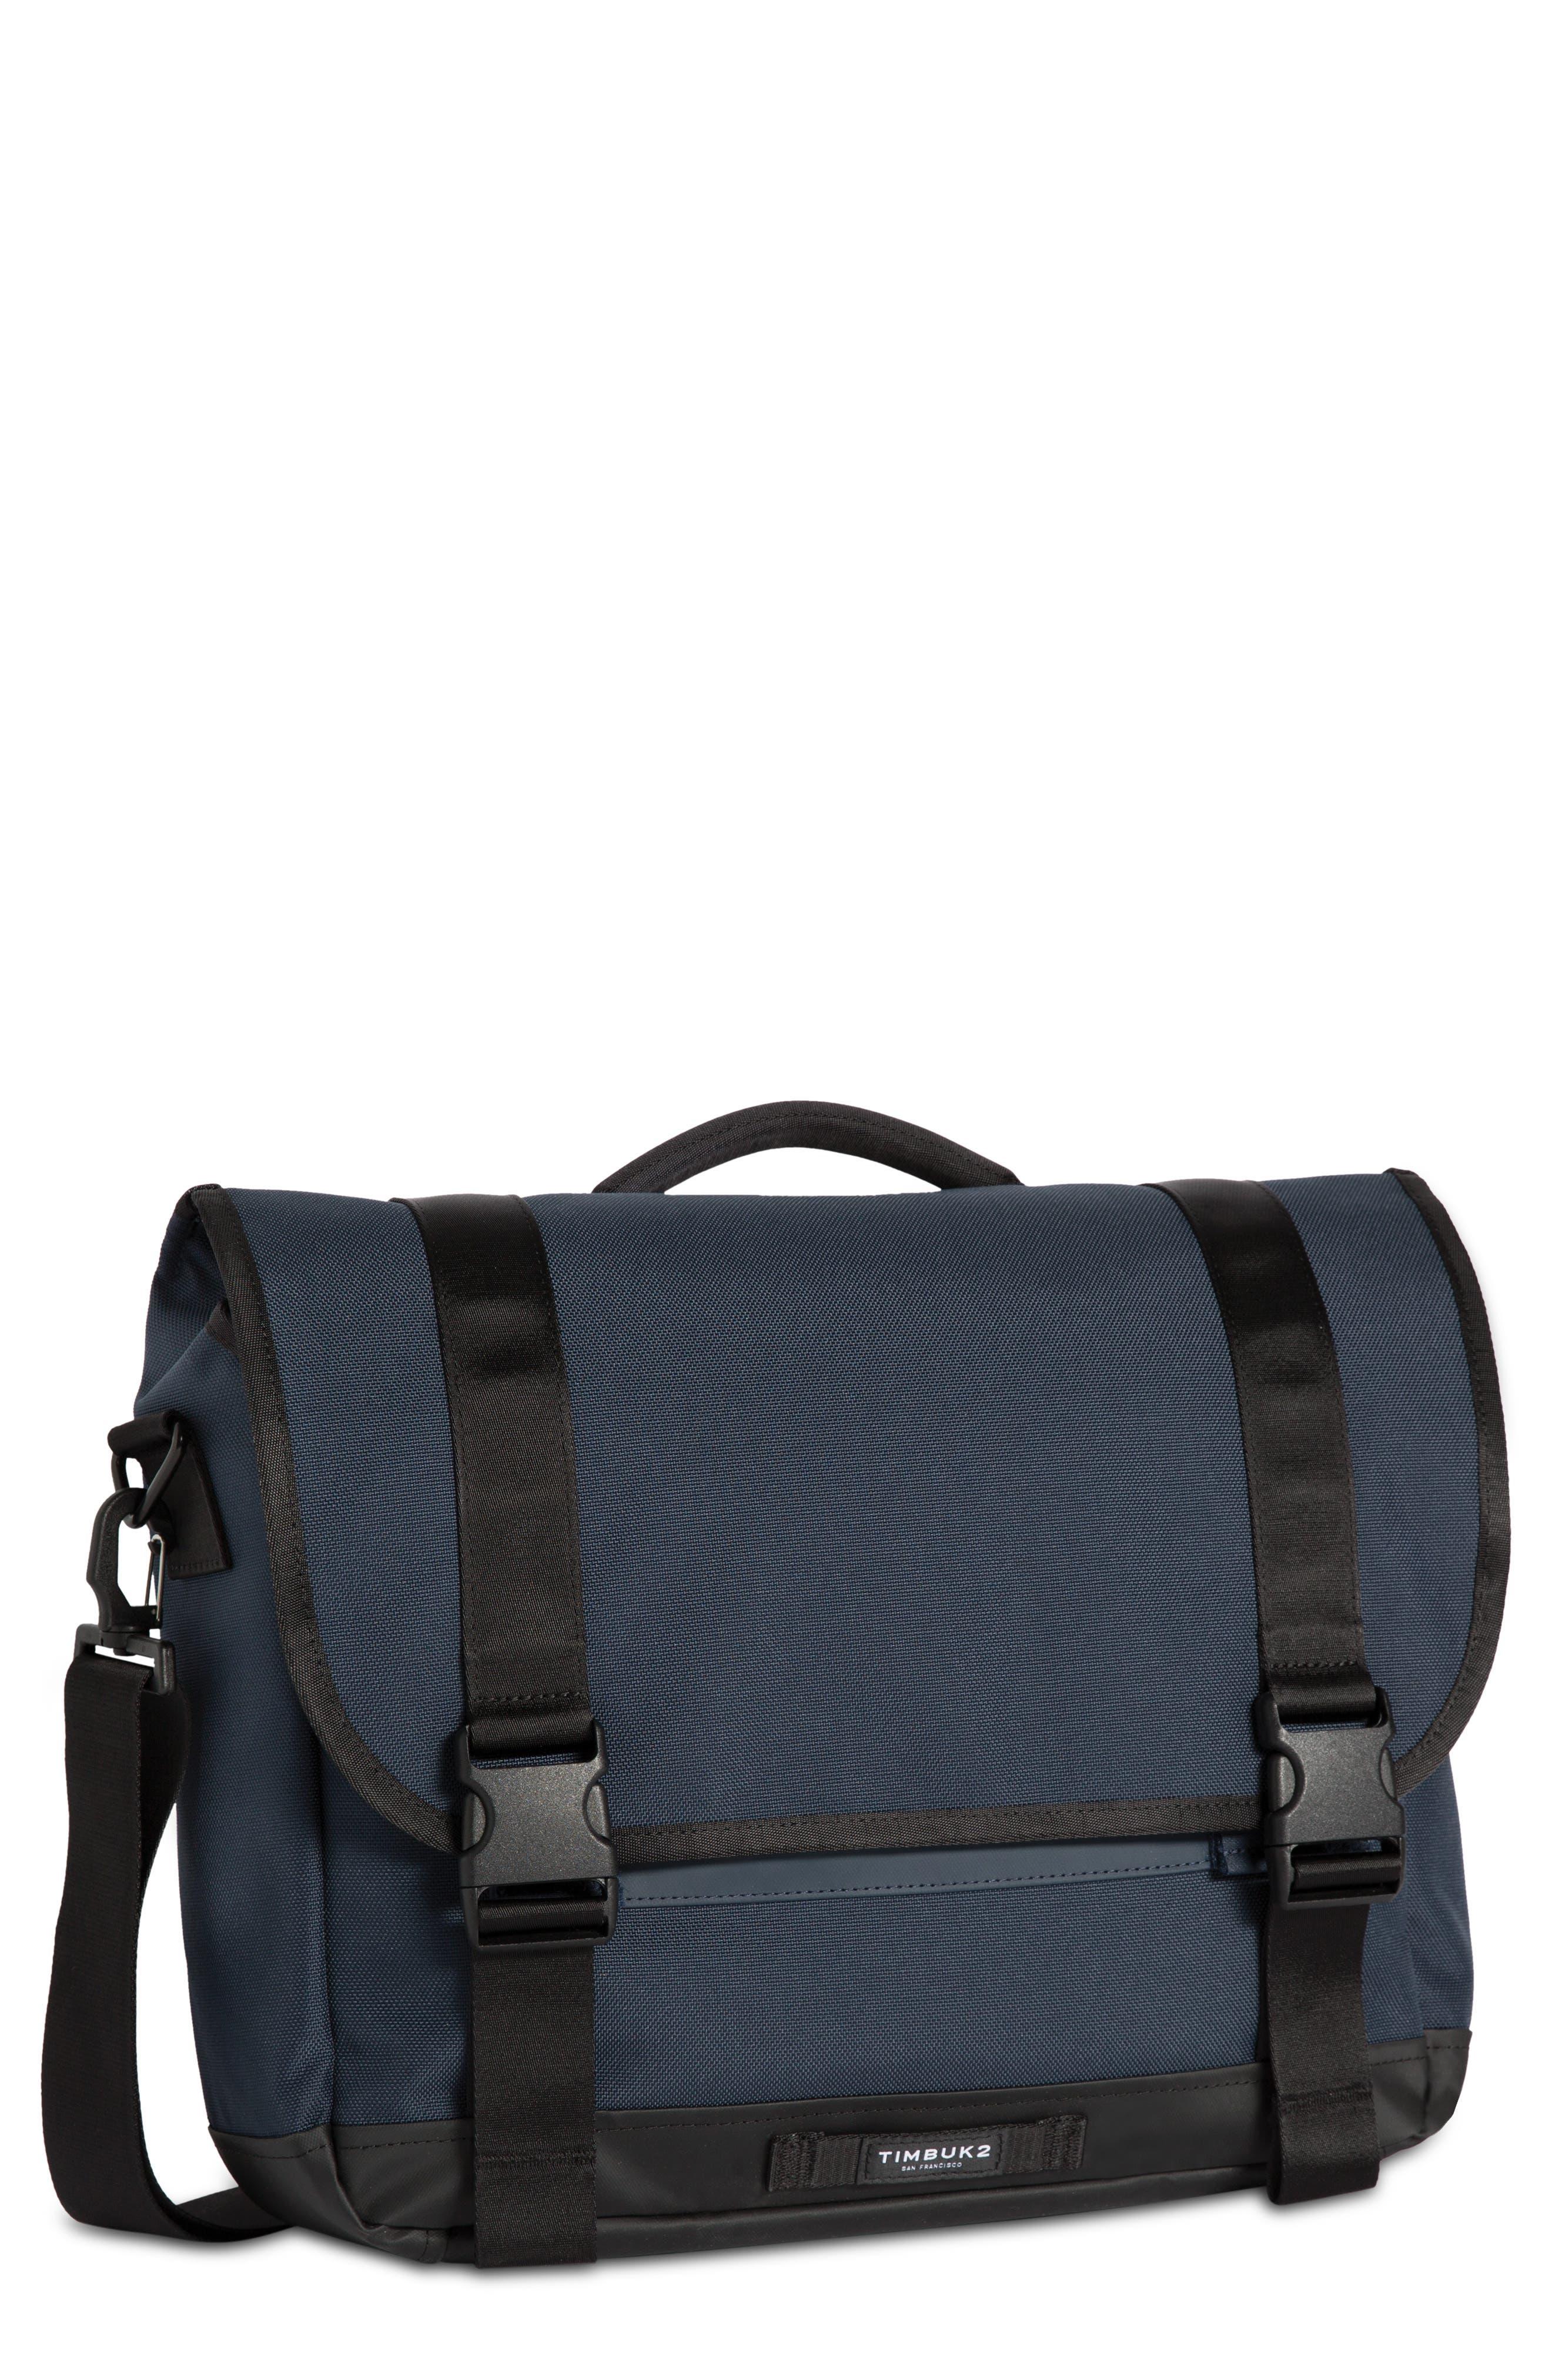 Nautical Design Cross Body Shoulder Messenger Laptop Bag